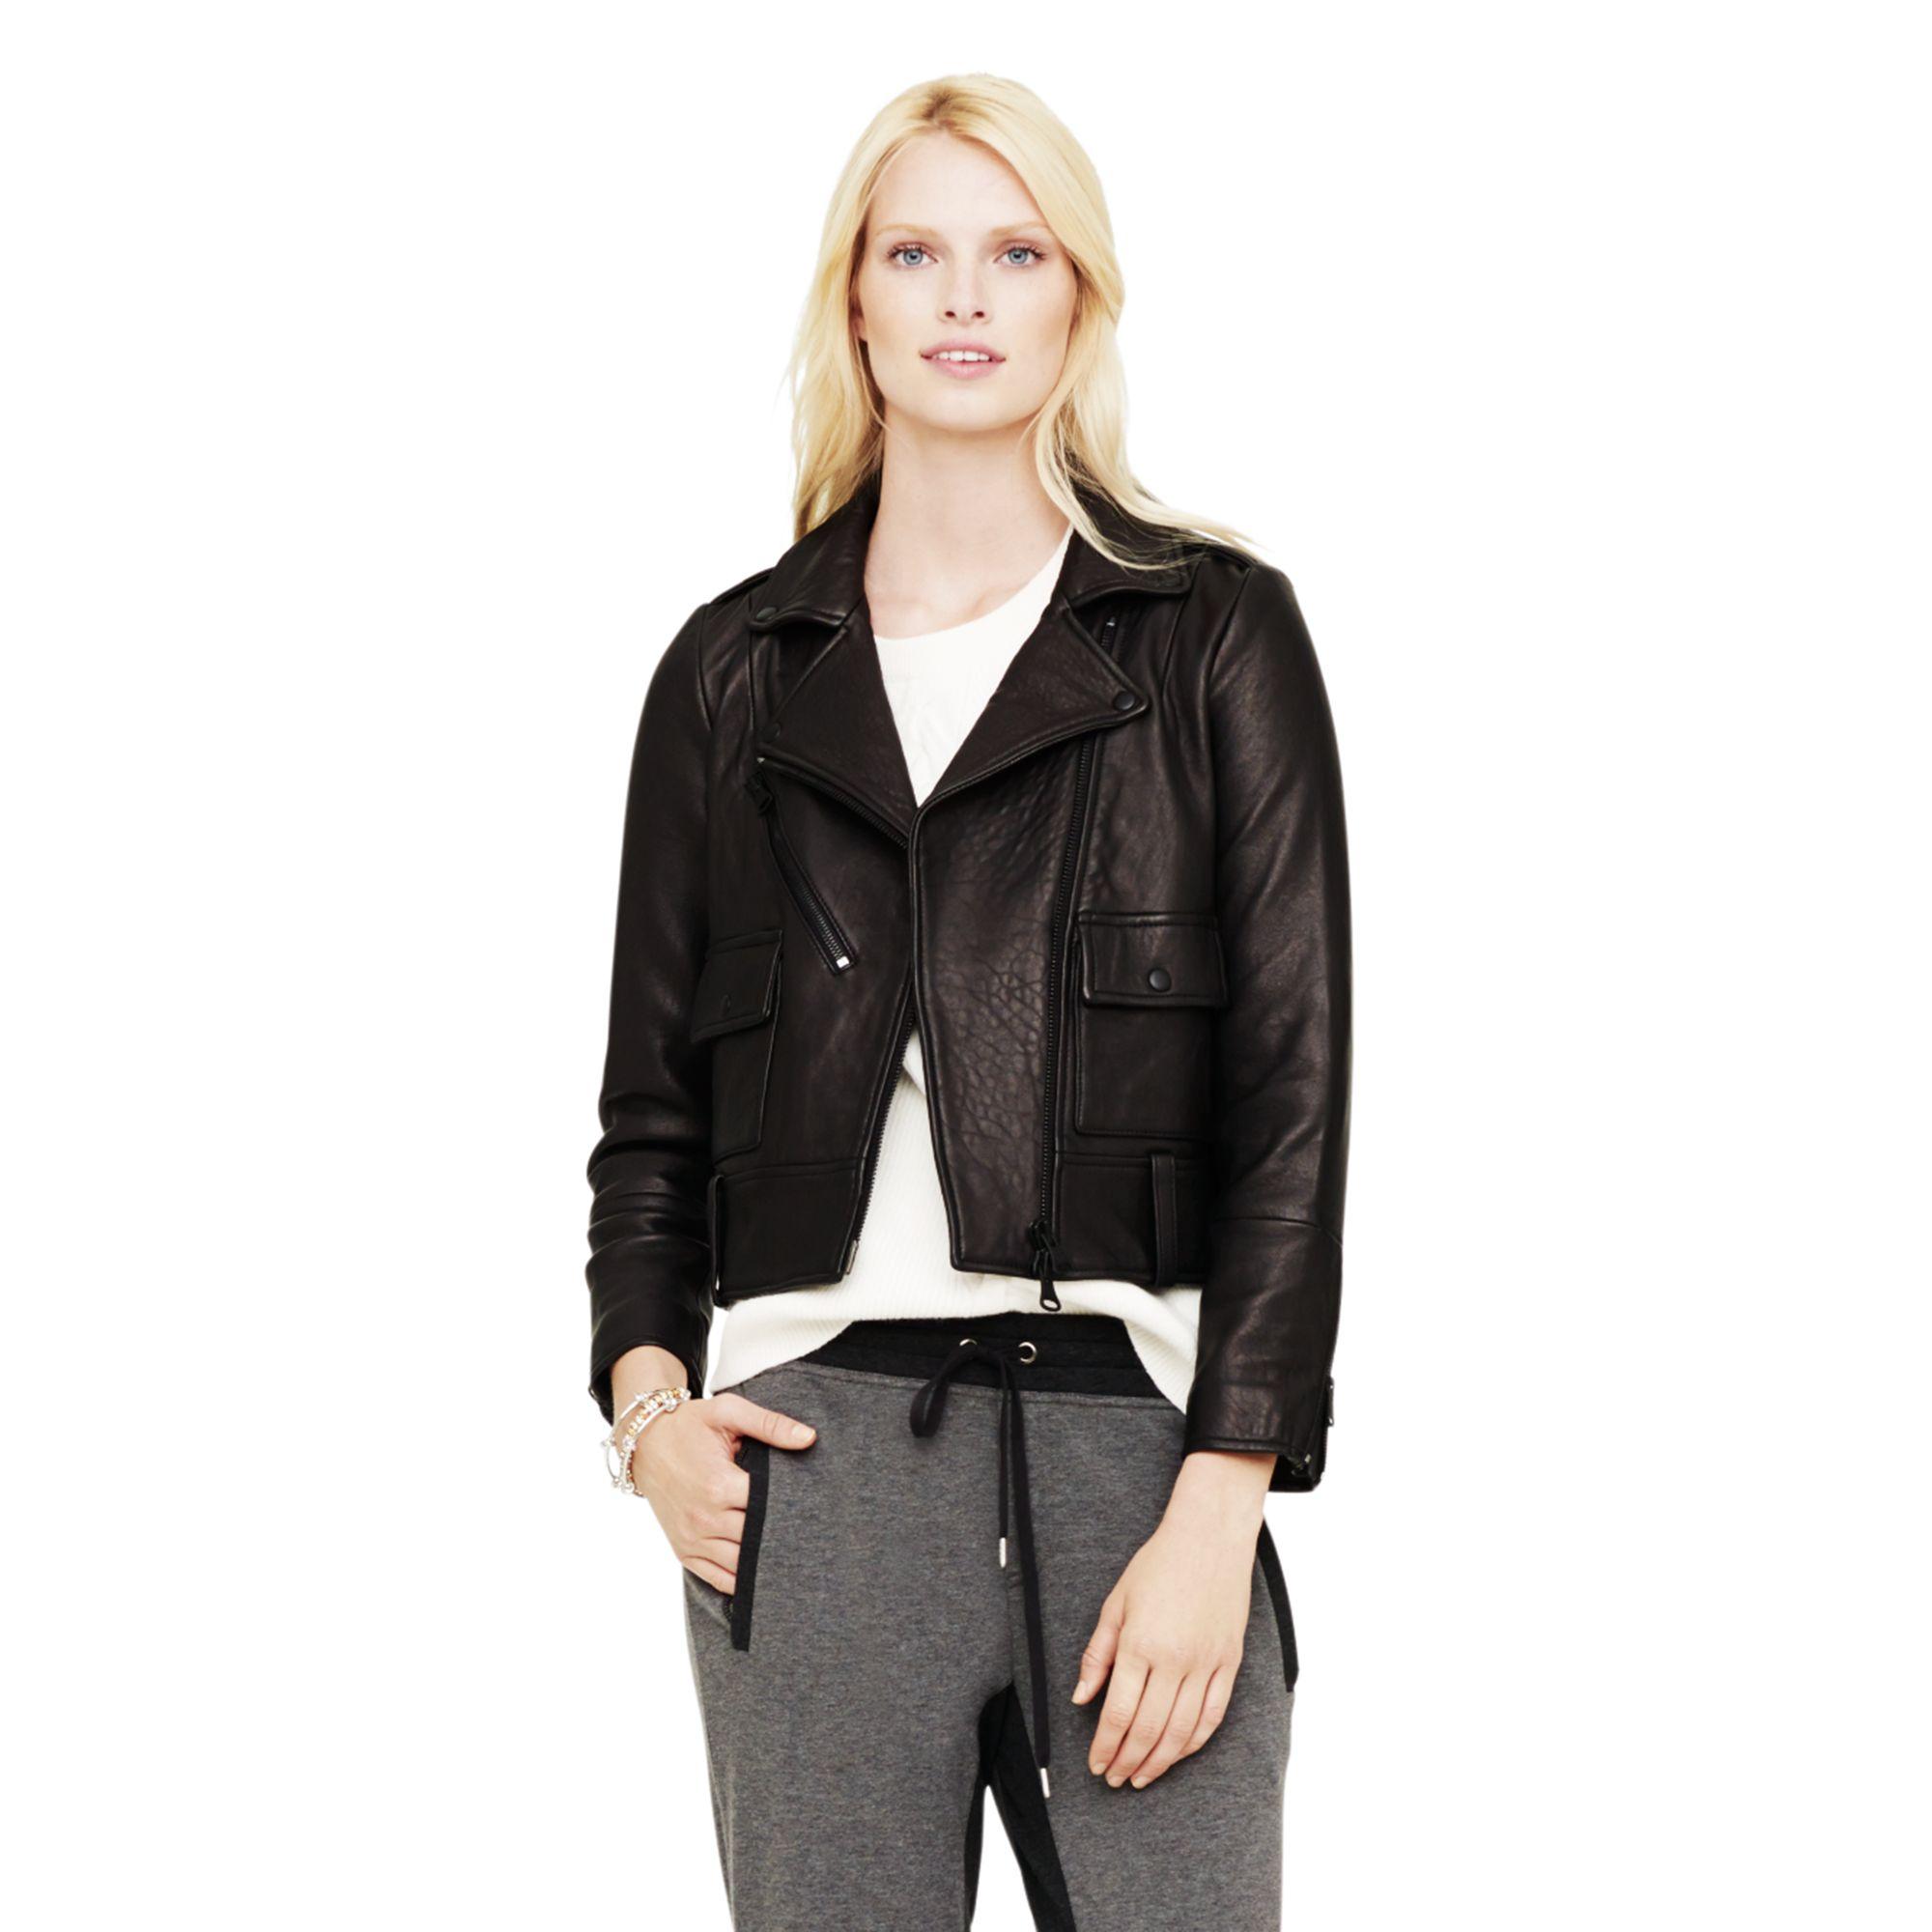 Lyst club monaco delaine moto jacket in black jpg 2000x2000 Club monaco  moto jacket 8a1b7c644